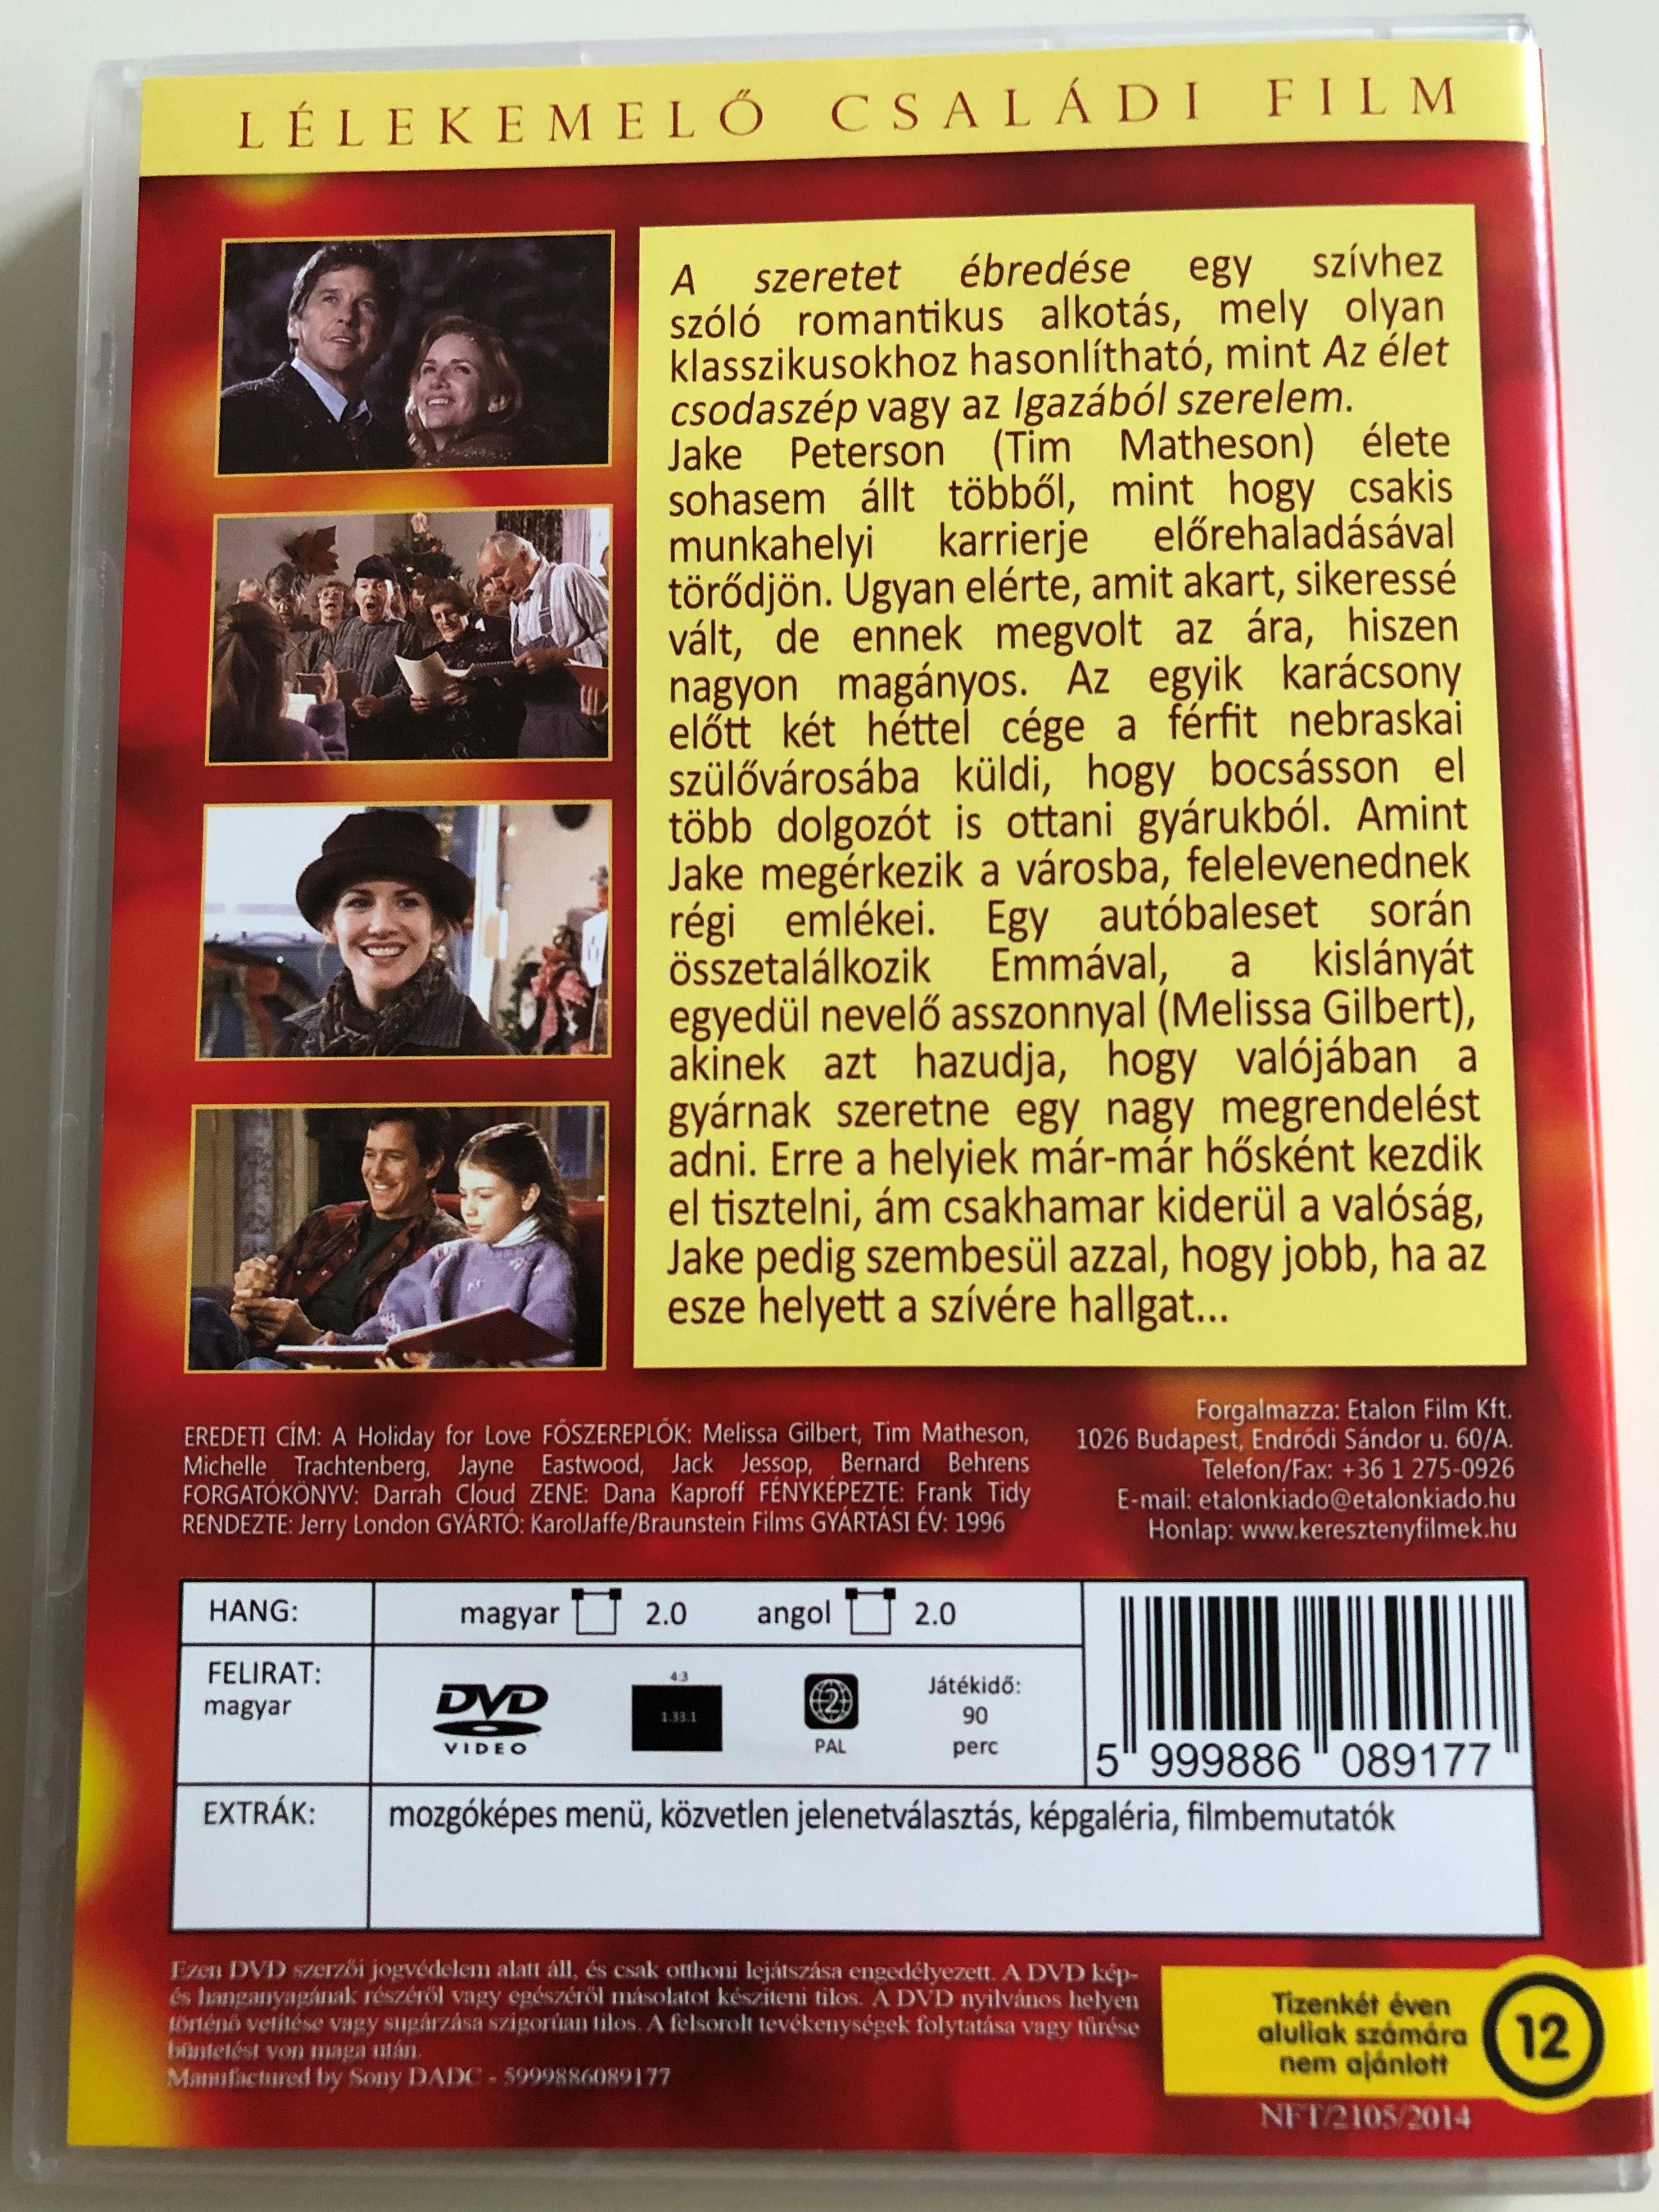 a-holiday-for-love-dvd-1996-a-szeretet-bred-se-kar-csonyi-szerelem-directed-by-jerry-london-starring-melissa-gilbert-tim-matheson-michelle-trachtenbert-jayne-eastwood-csal-di-filmt-r-2-.jpg